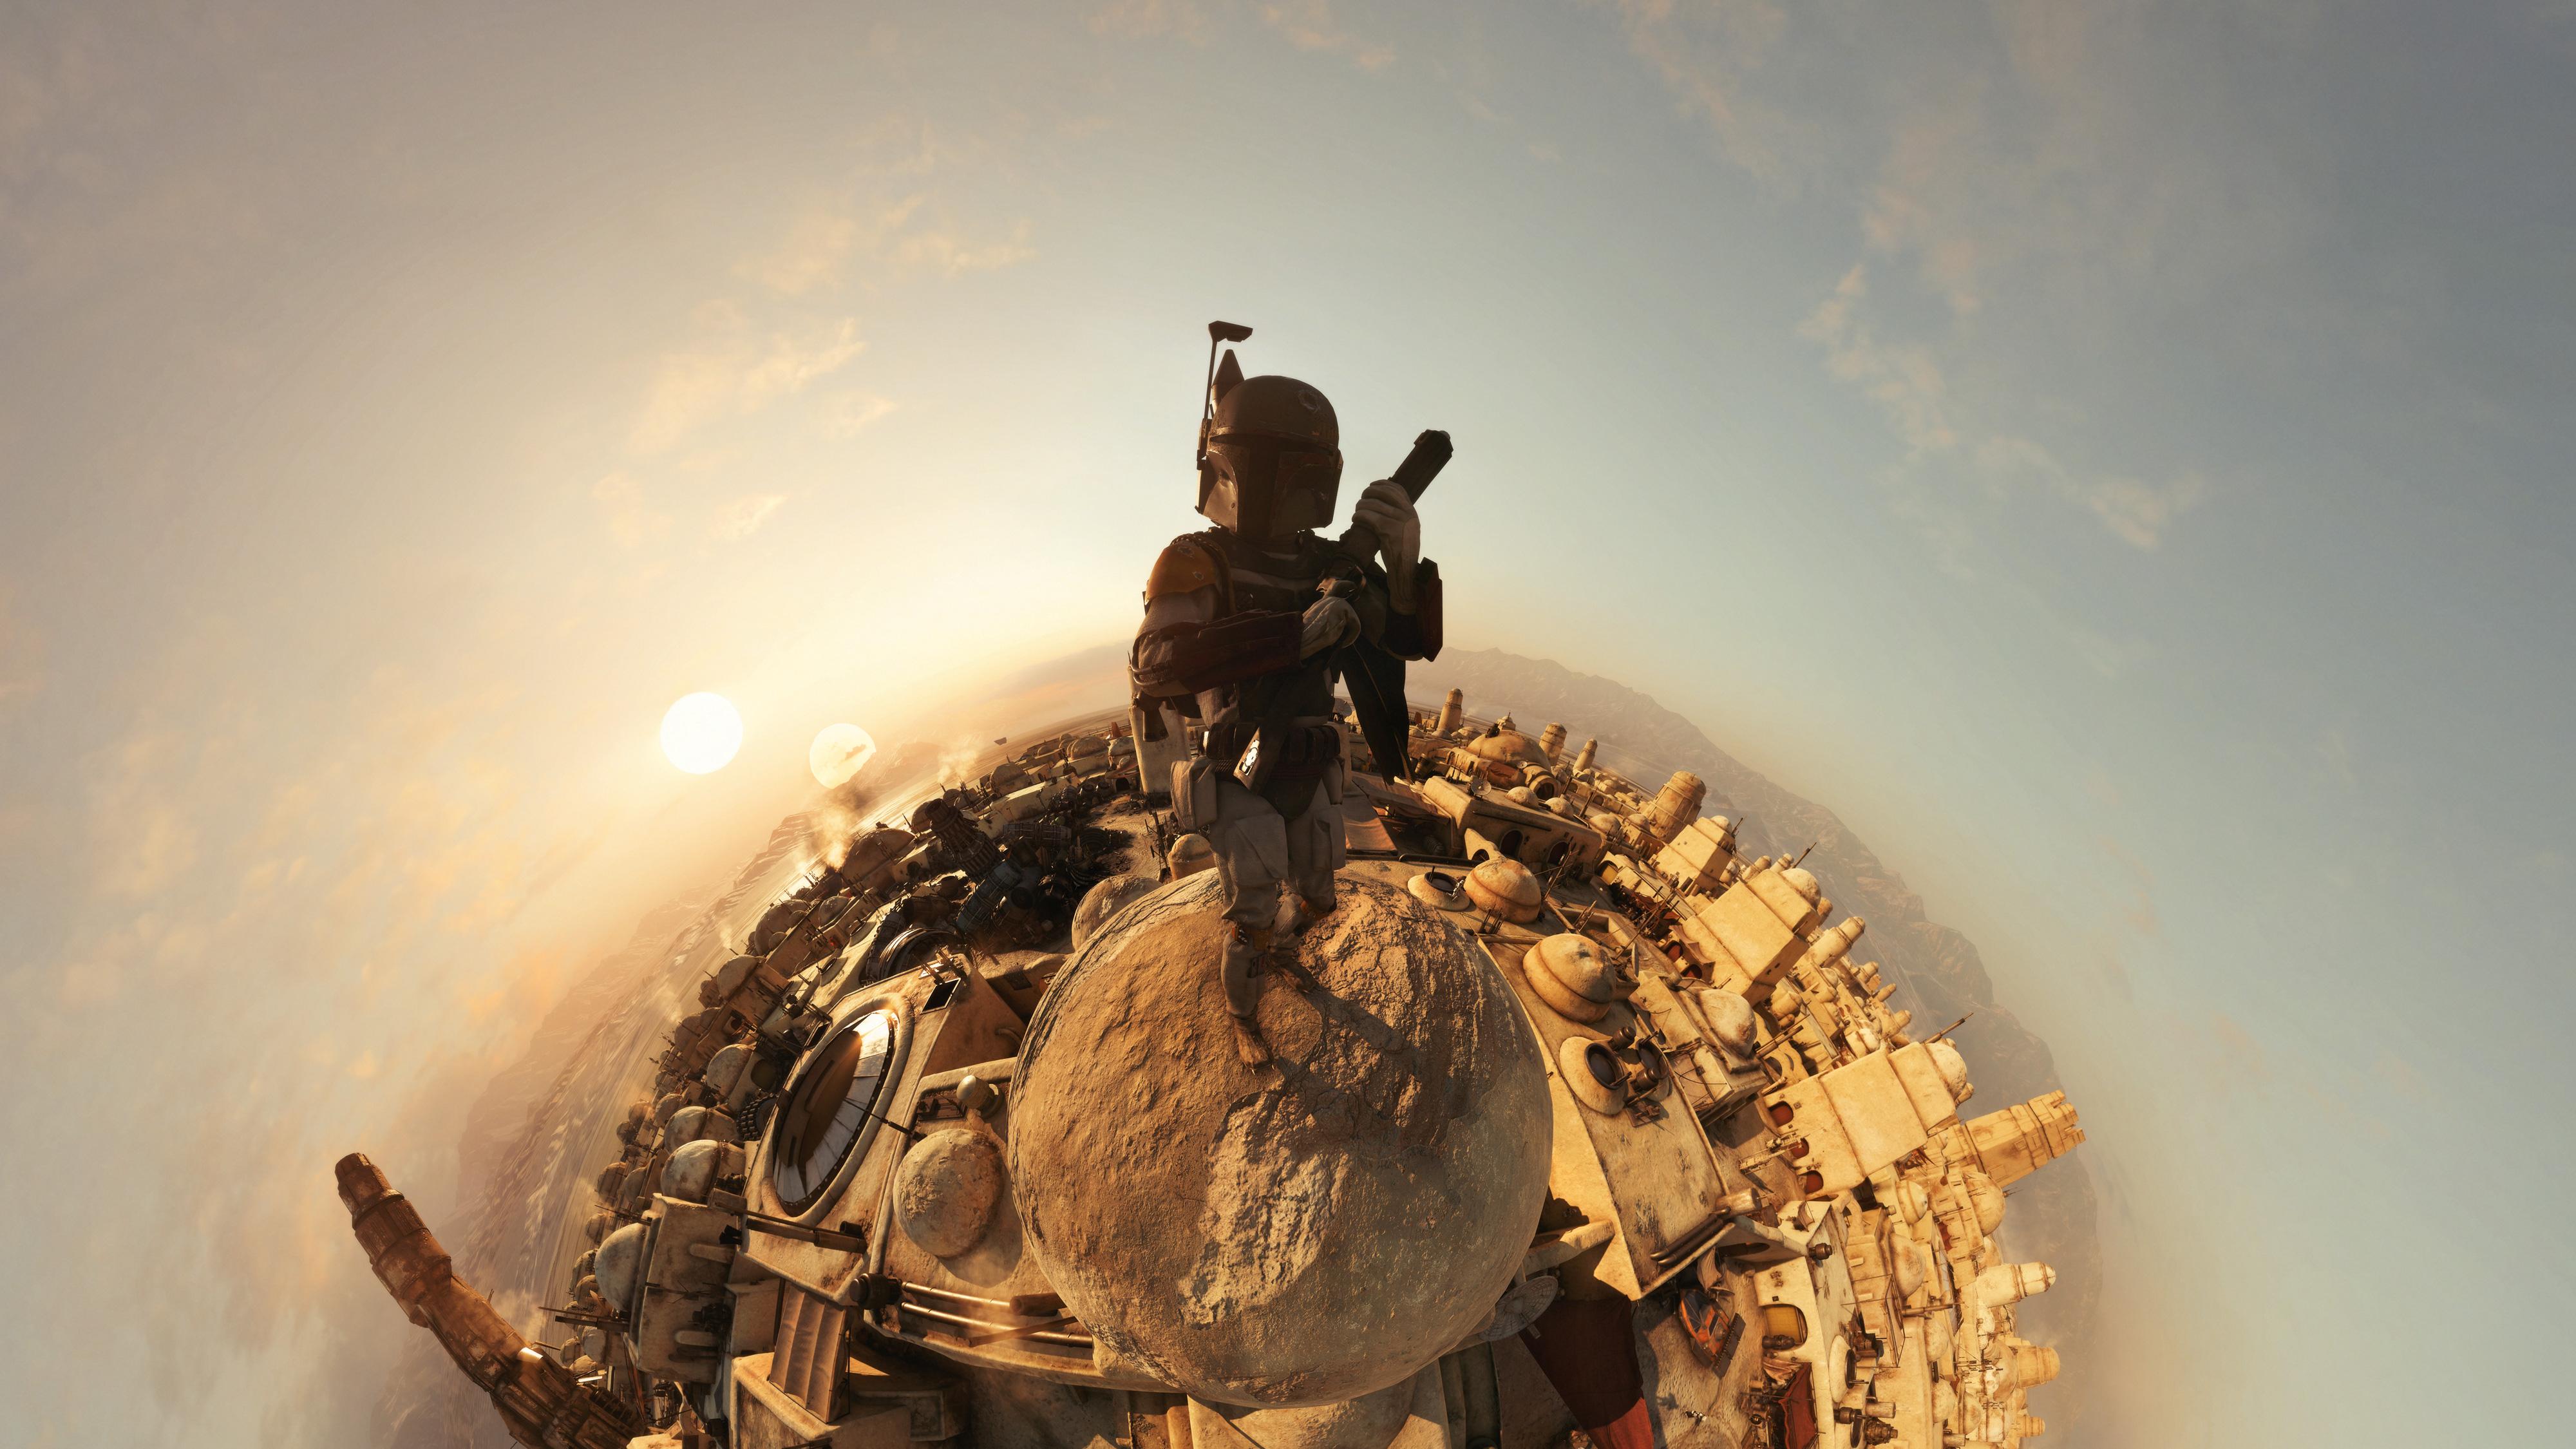 4k Star Wars Battlefront II, HD Games, 4k Wallpapers ...